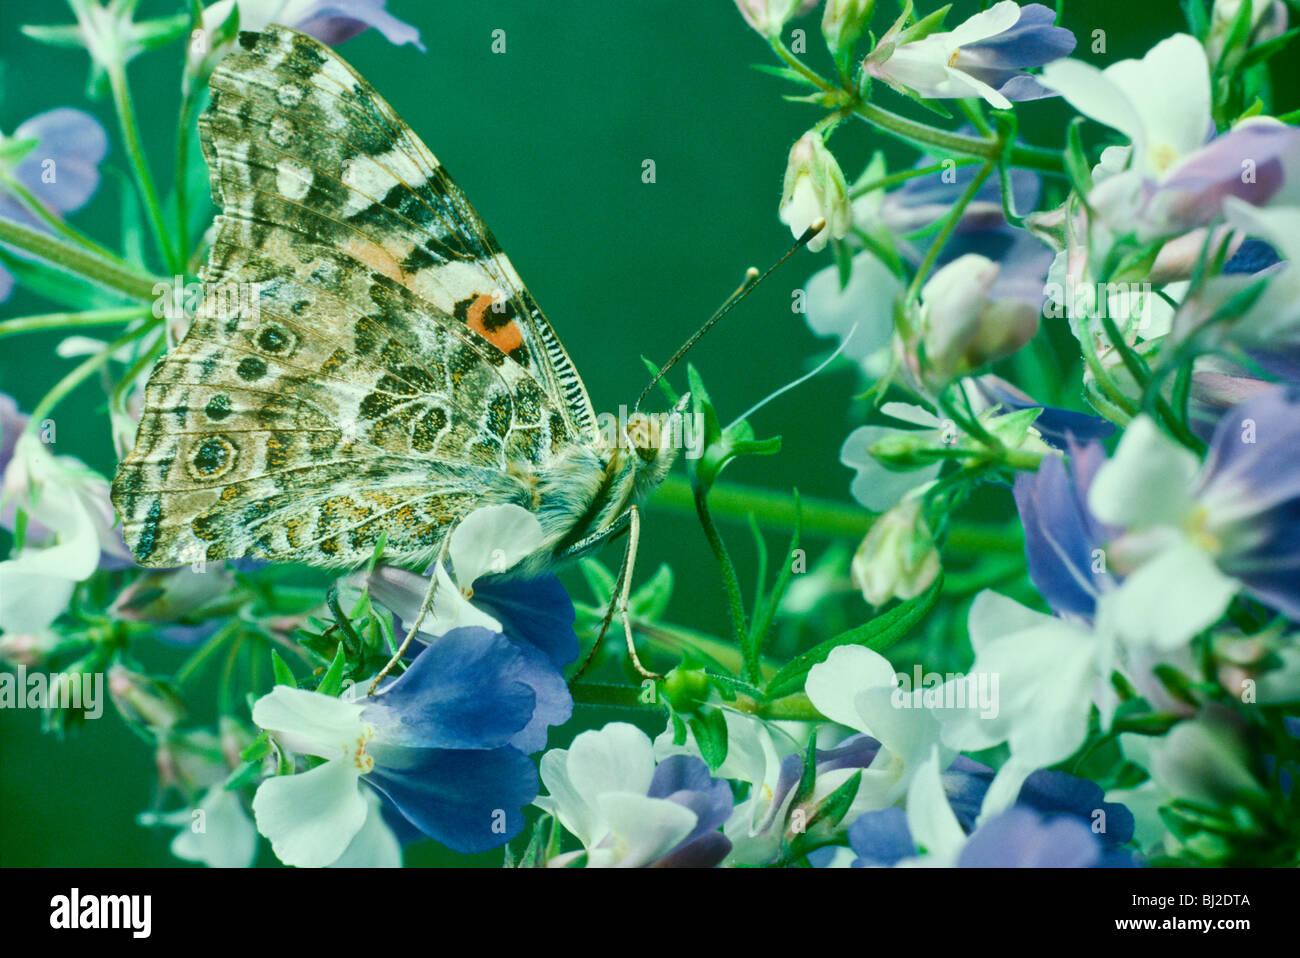 Collinsia Stockfotos & Collinsia Bilder - Alamy